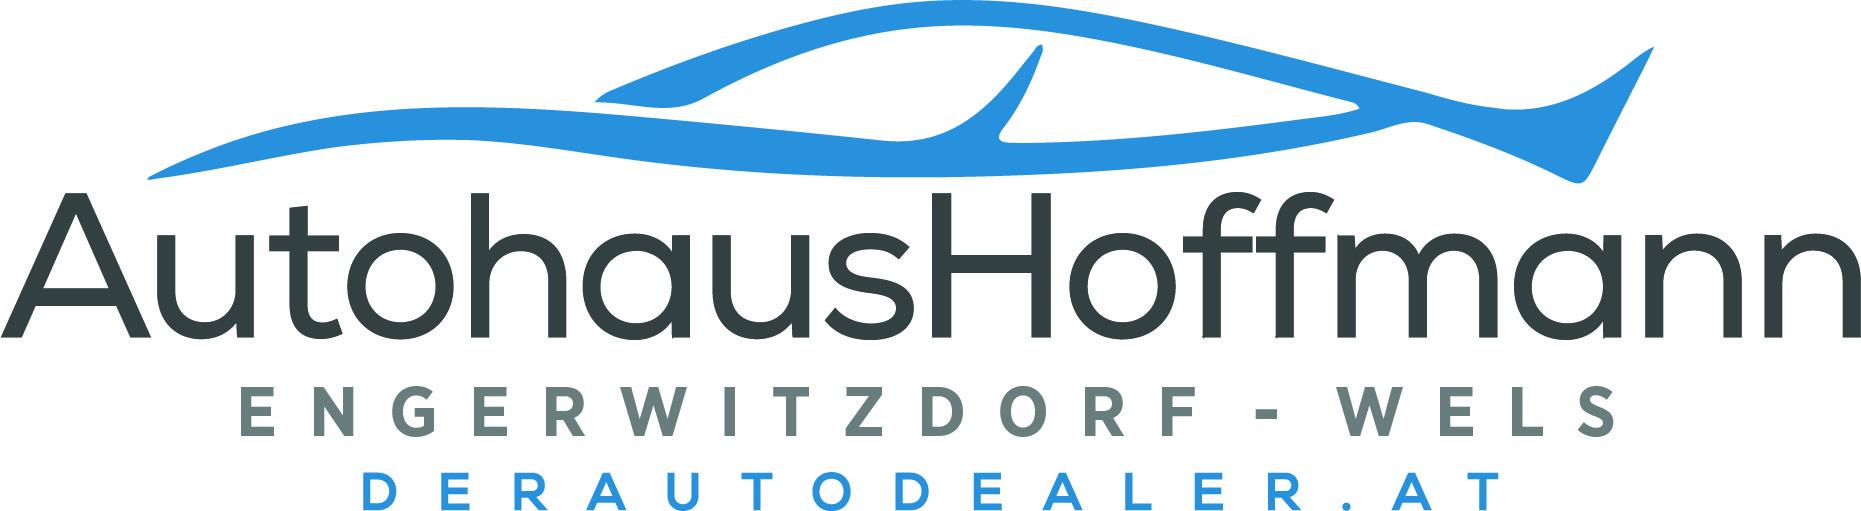 Audodealer_Logo